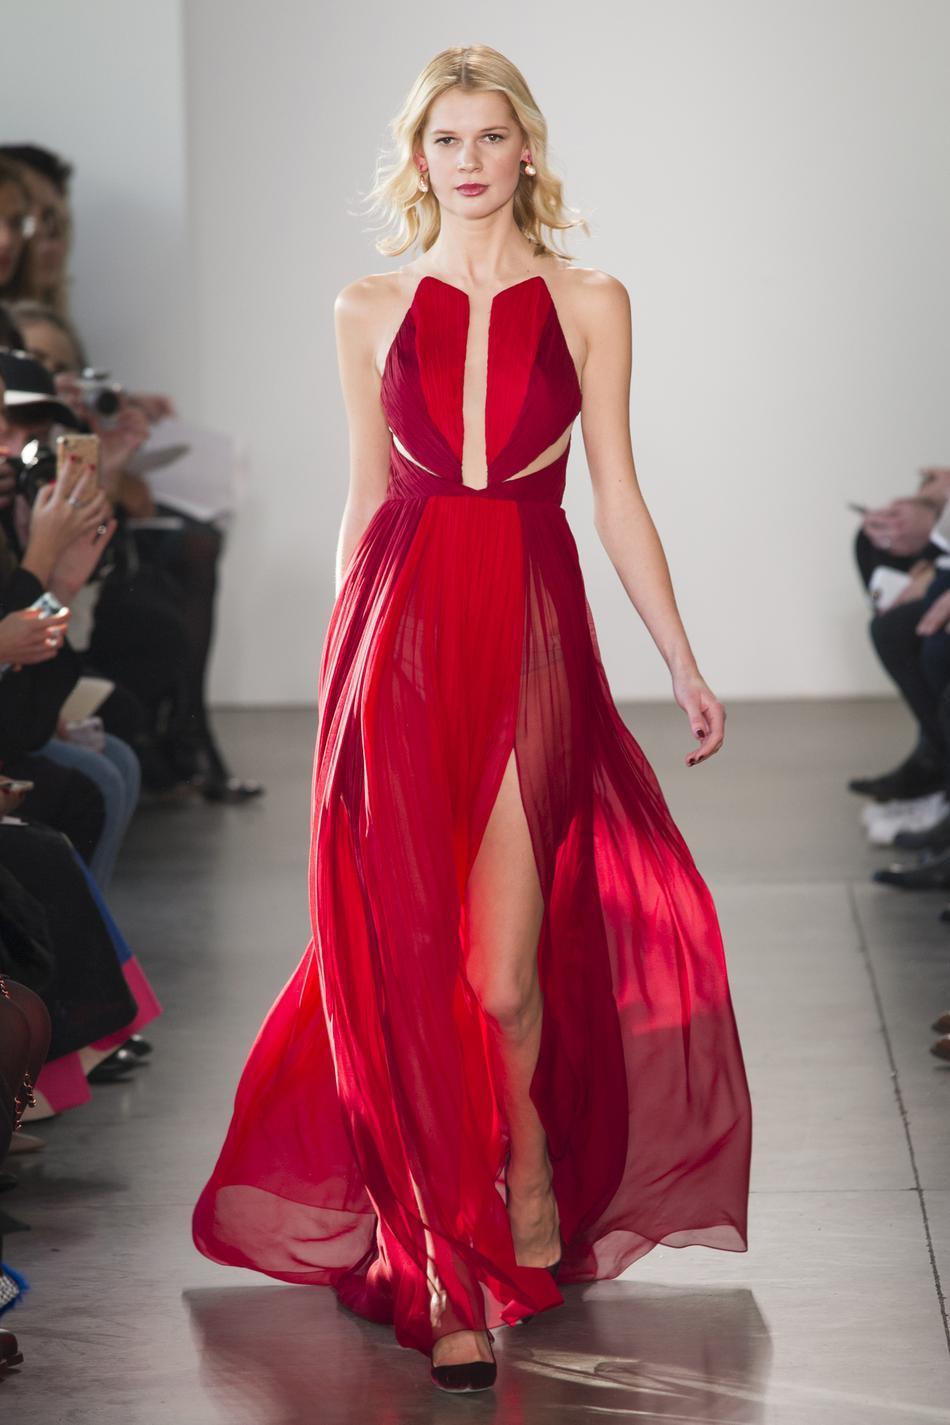 ... ces robes qui font rêver - Valentino Fashion Week automne-hiver  2017-2018   ces robes qui font rêver - Oscar de la Renta Fashion Week  automne-hiver ... bff4d96572f